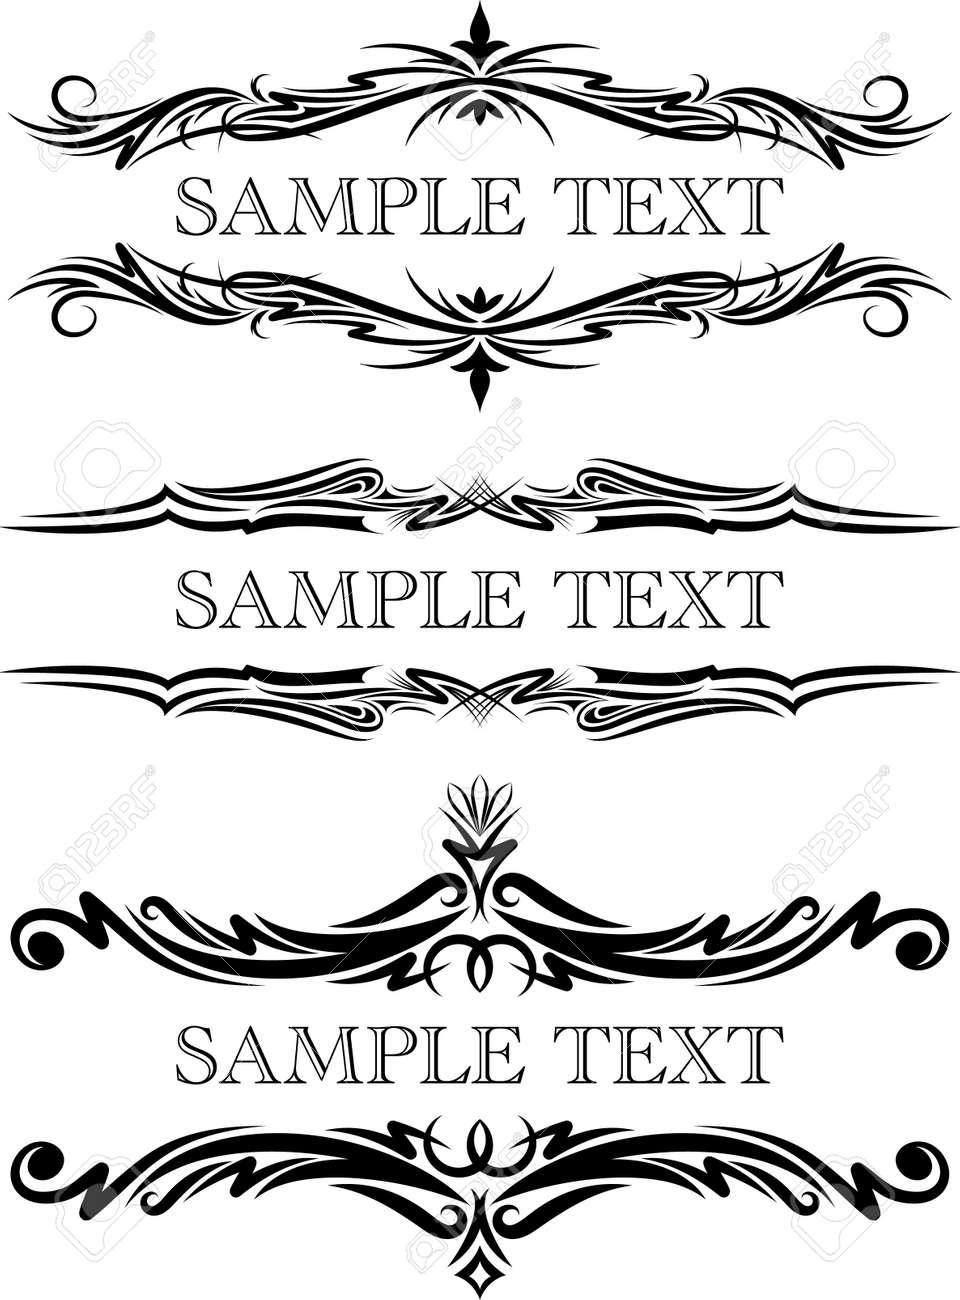 Elegant texts frames. Stock Vector - 10707401